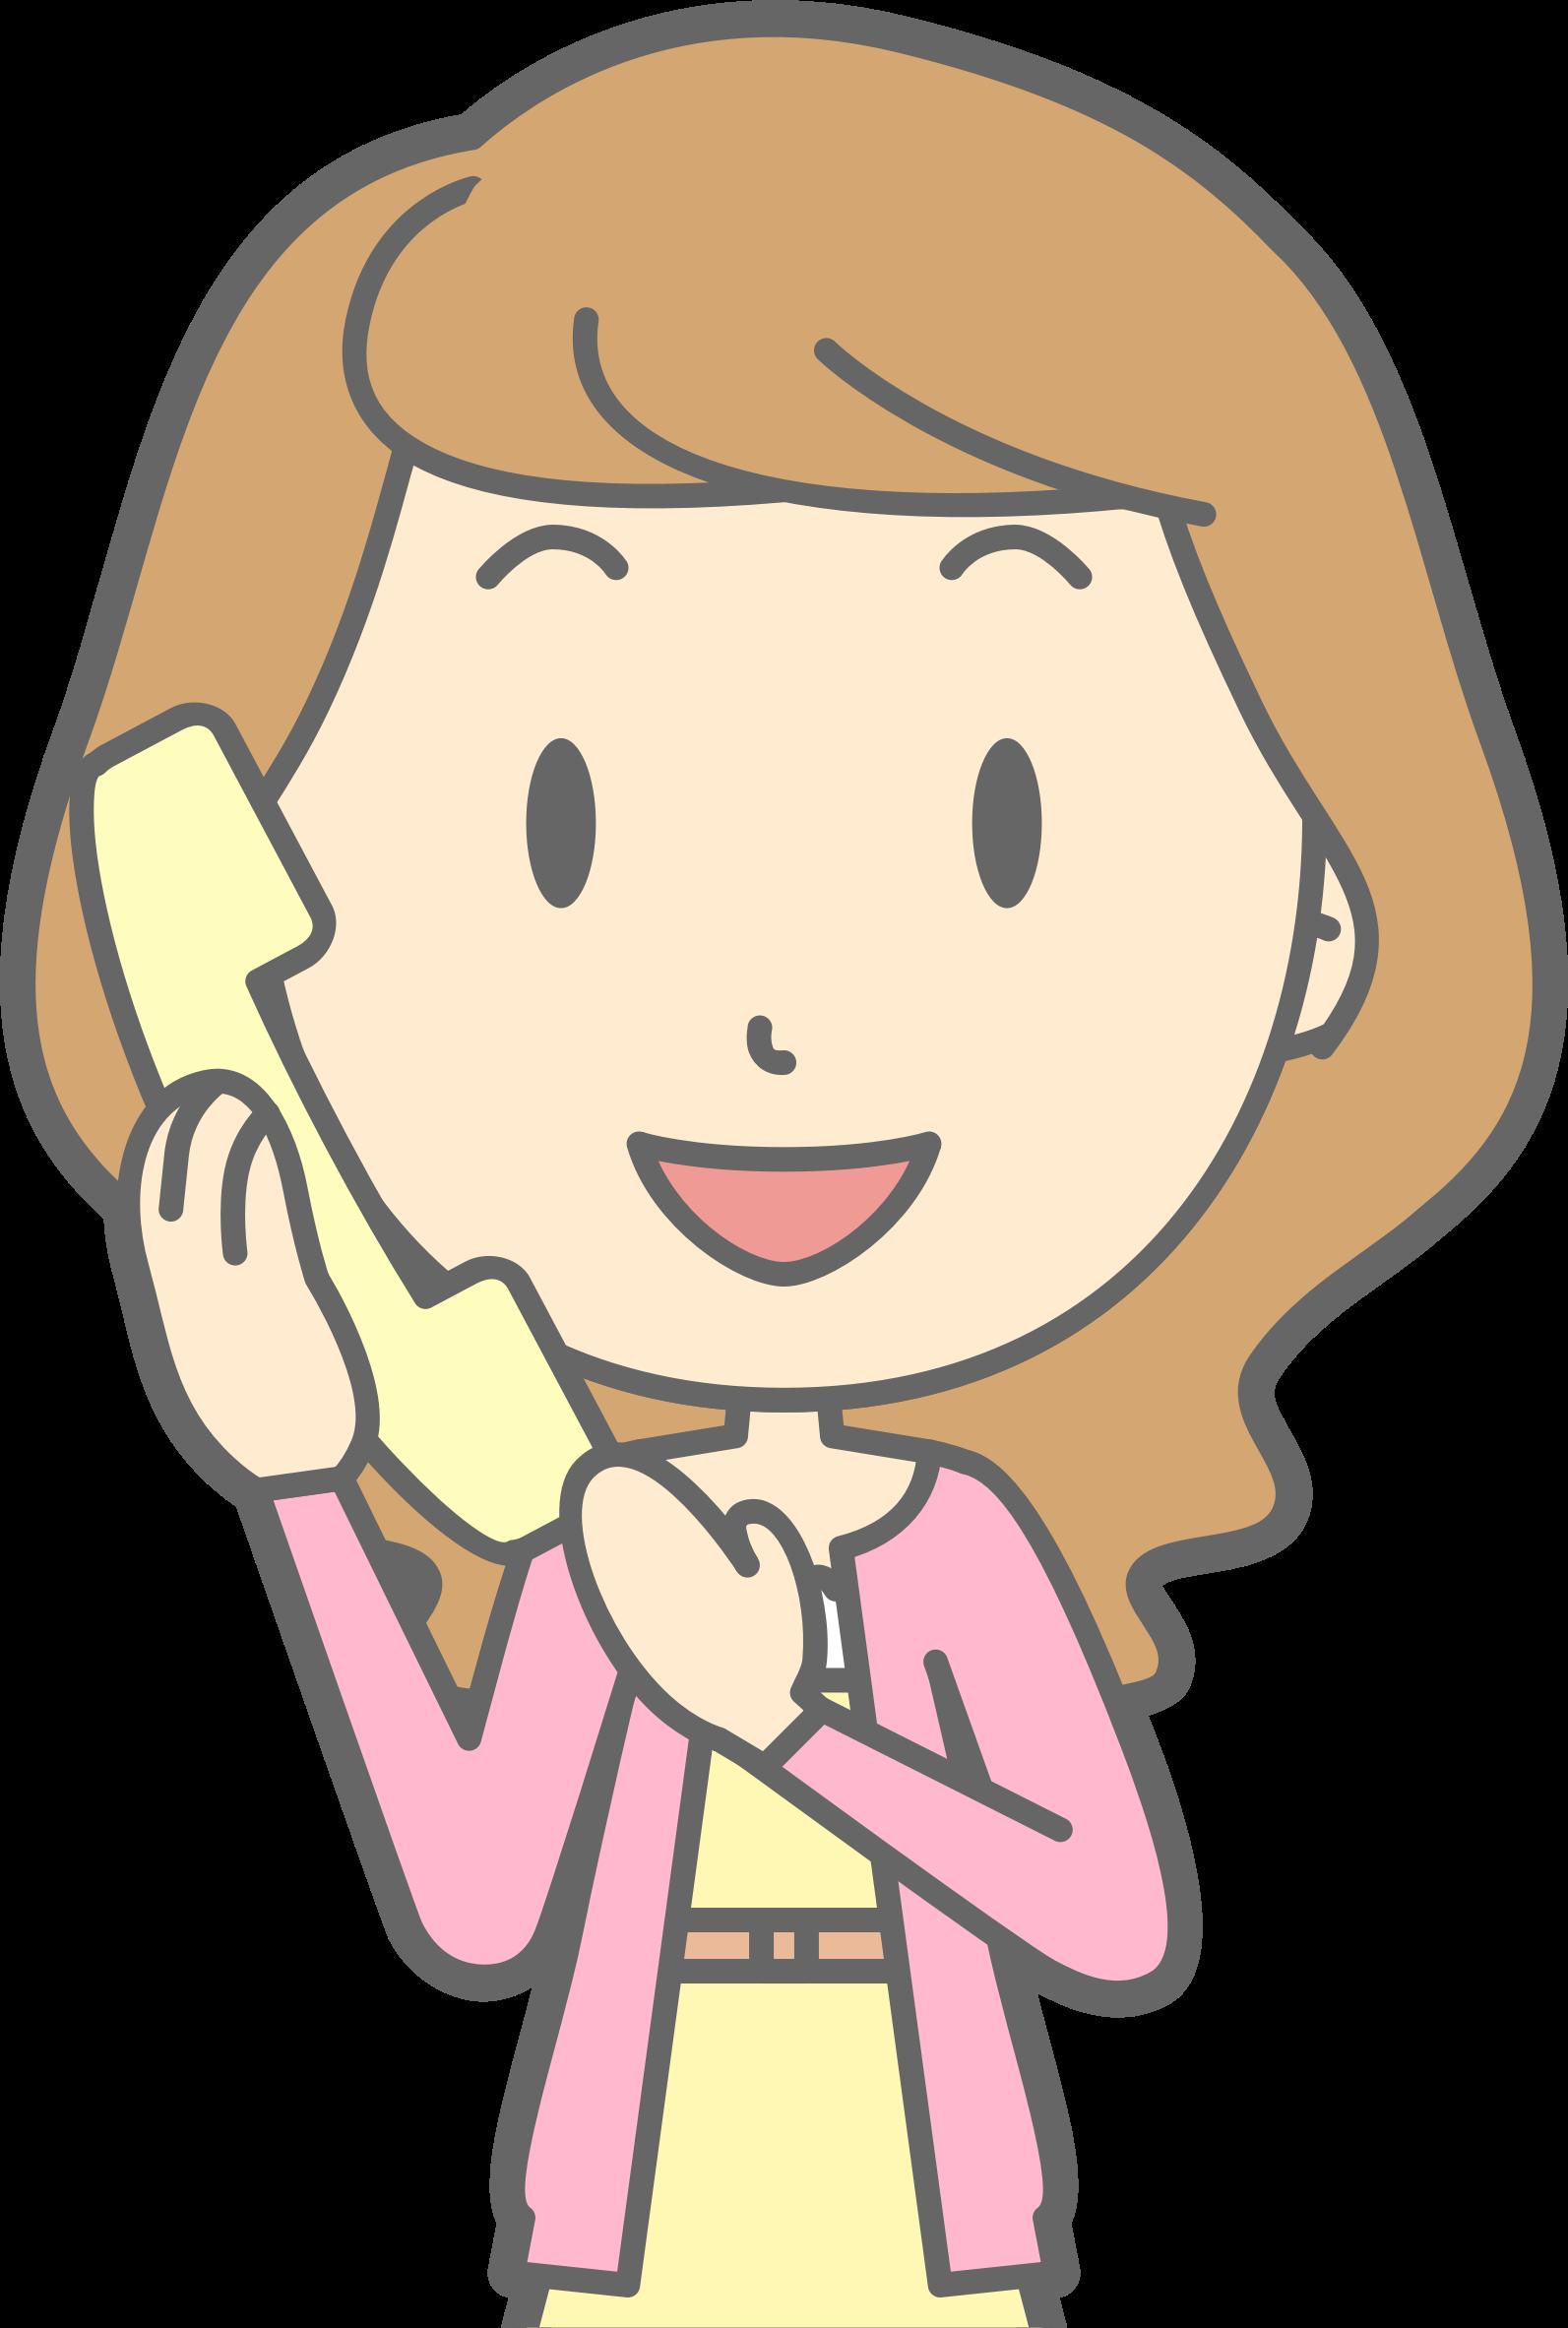 Telephone clipart clip art pink. Female using big image